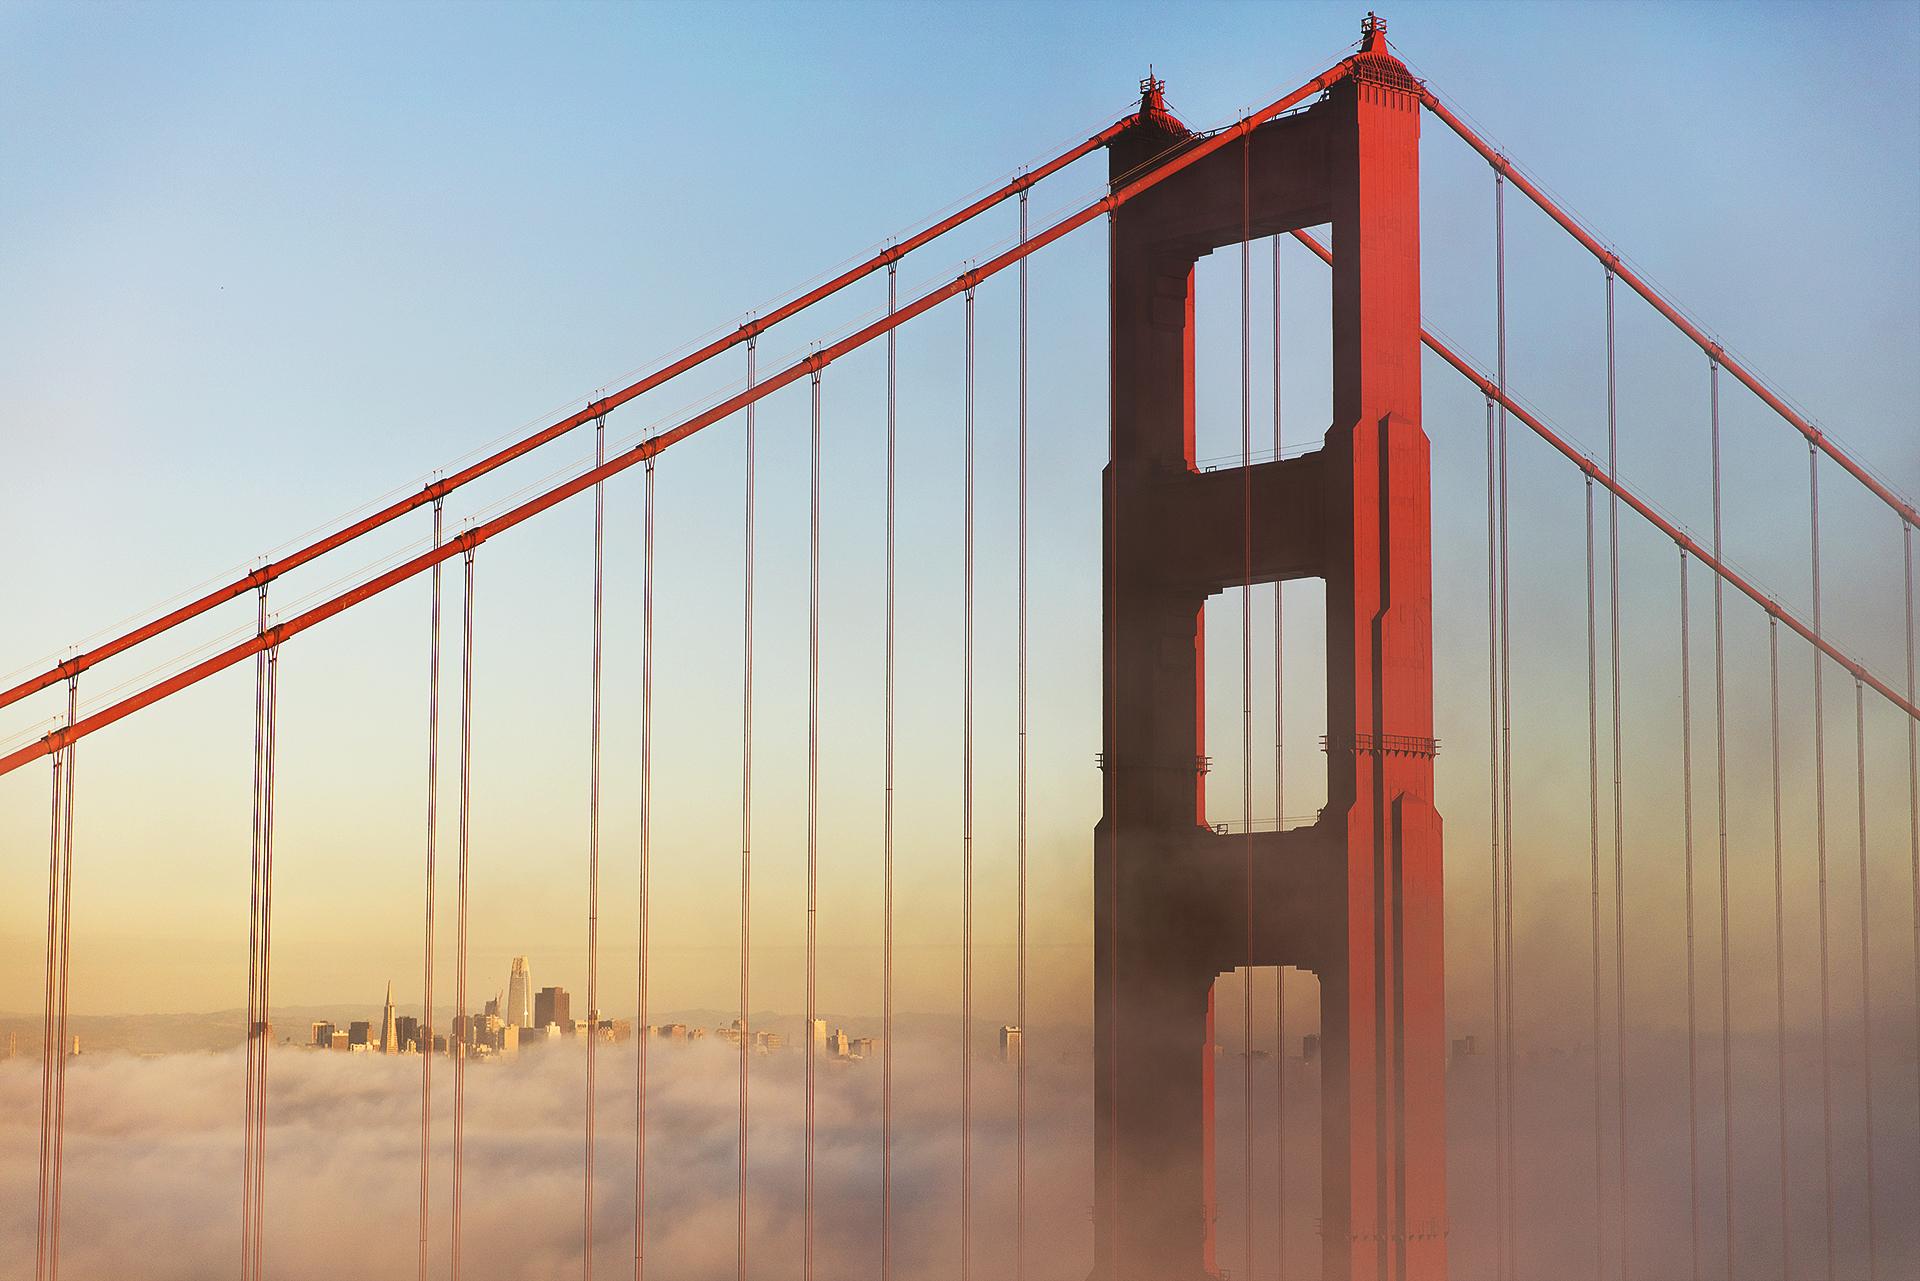 More Than Just Photos 647 - Golden Gate Bridge